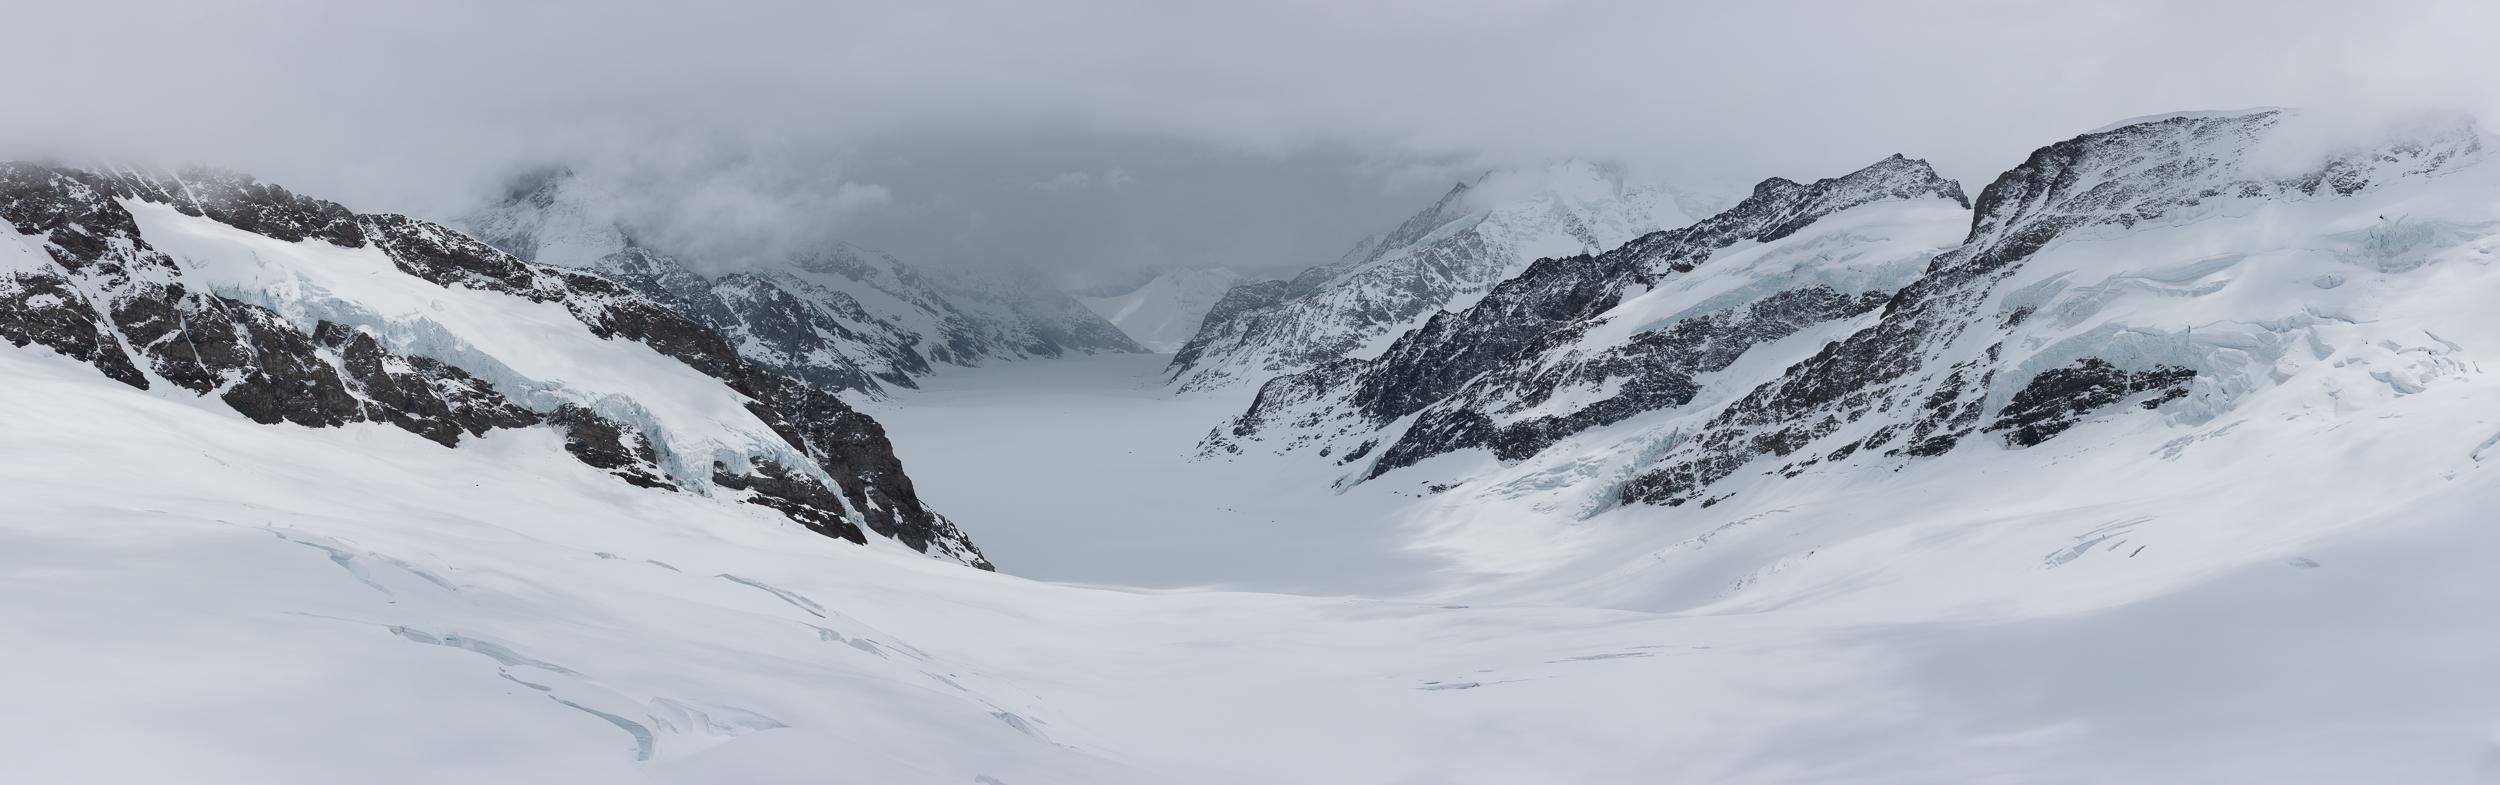 Mountain landscape - Switzerland